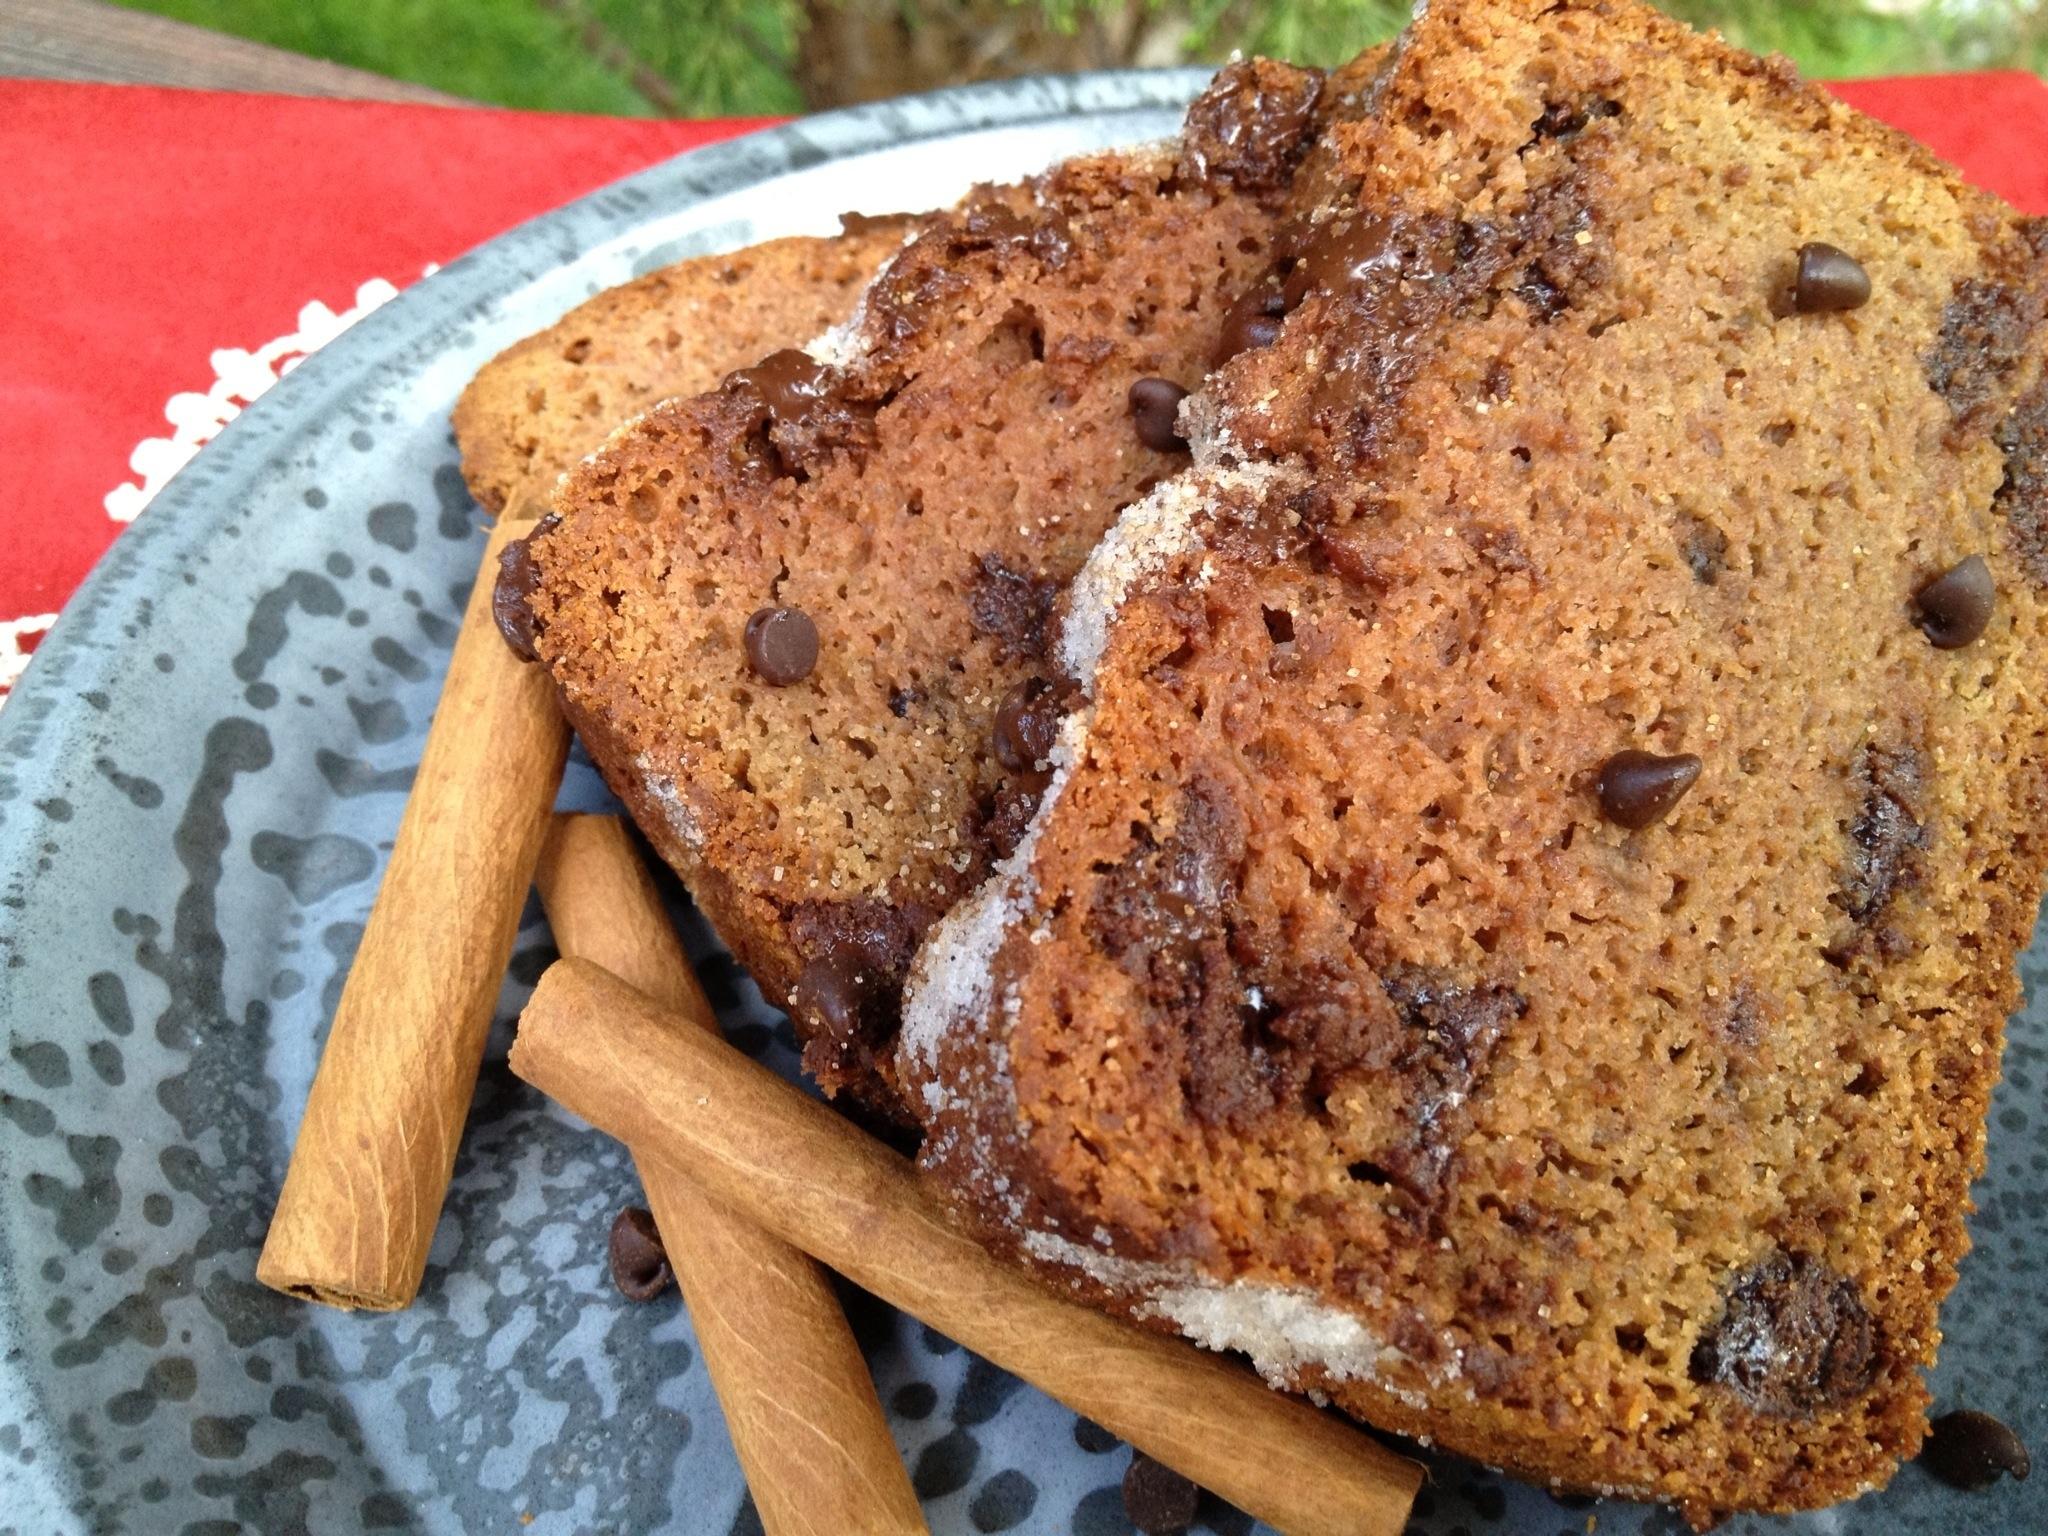 Mexican Hot Chocolate Amish Friendship Bread by Paula Altenbach | friendshipbreadkitchen.com